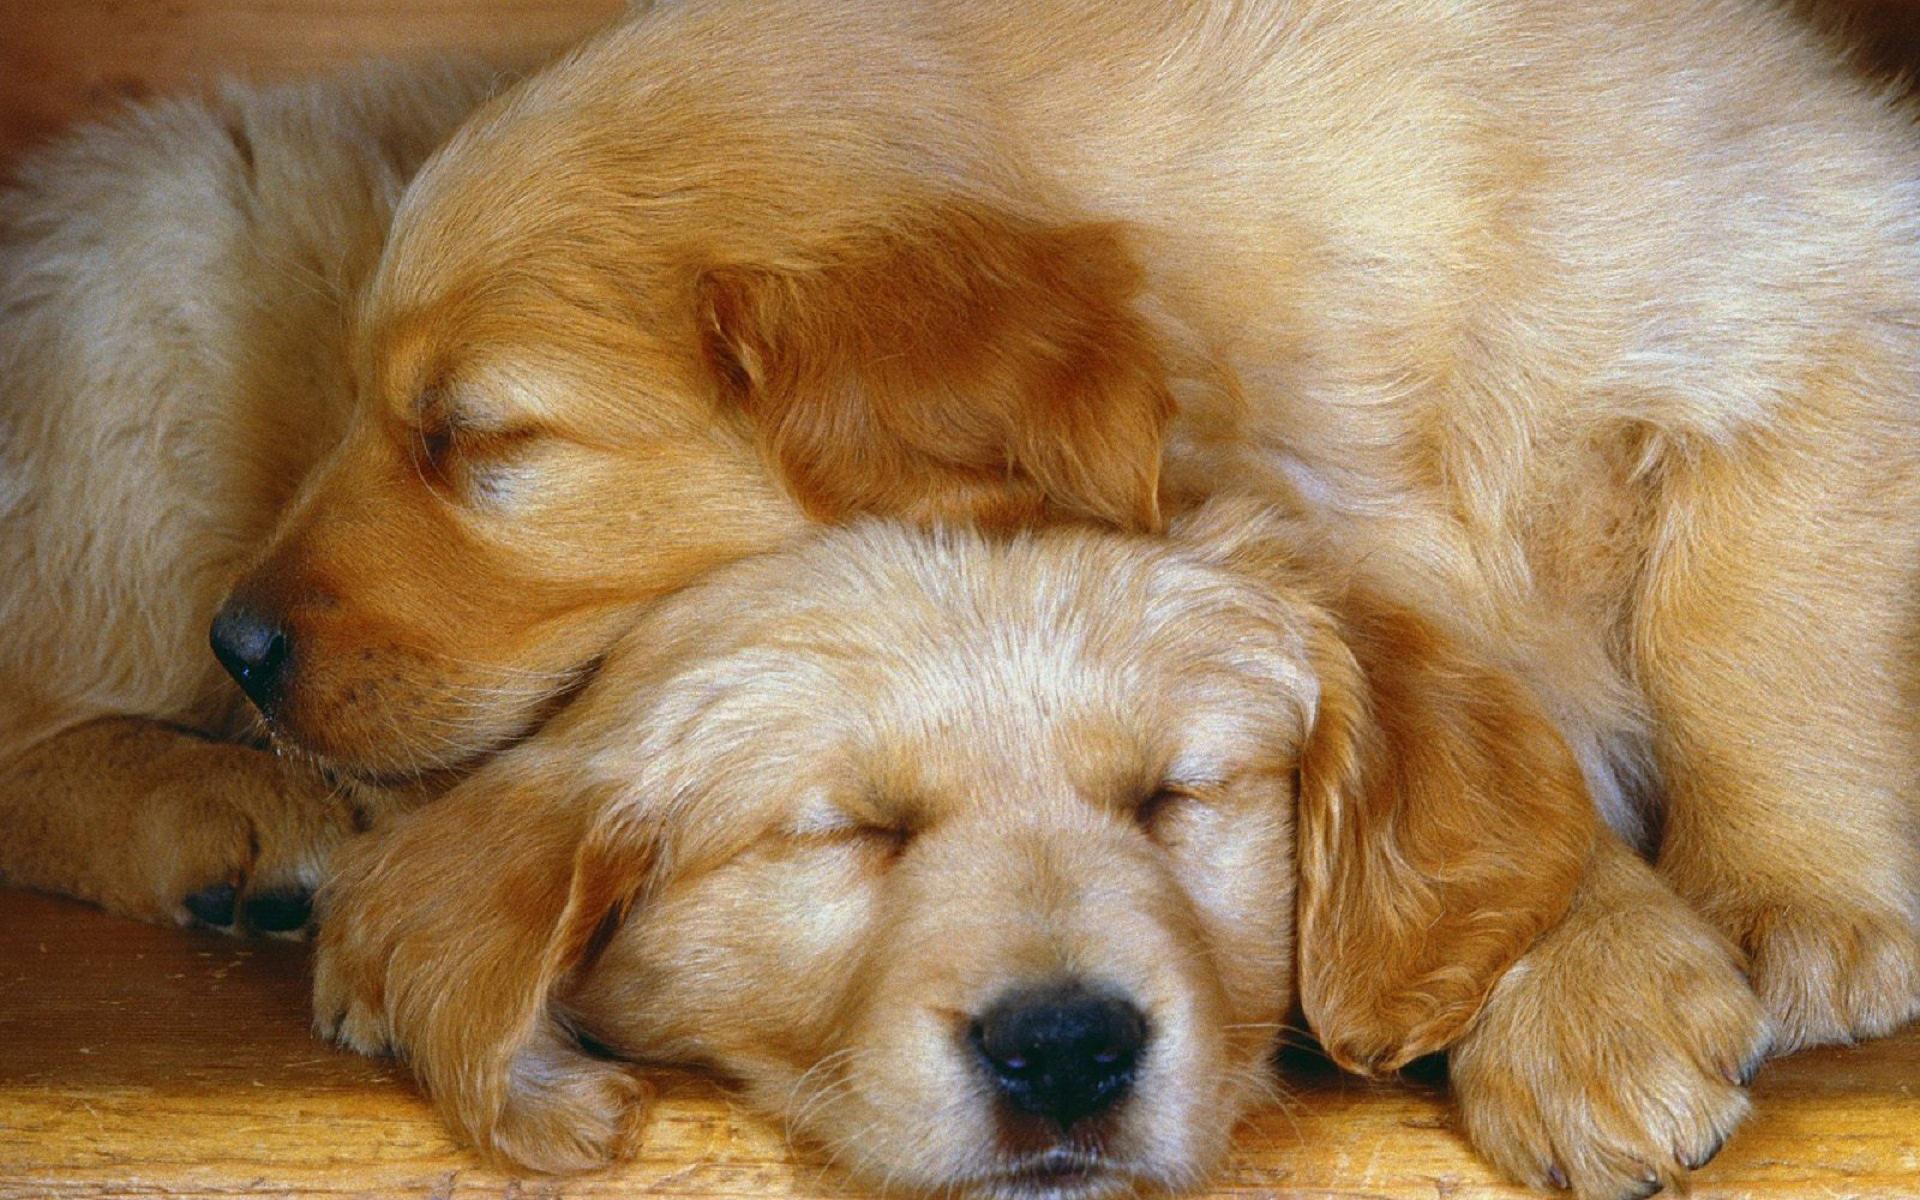 Animal Close Up Cute Dog Golden Retriever Puppy Sleeping Wallpaper Resolution 1920x1200 Id 1002809 Wallha Com